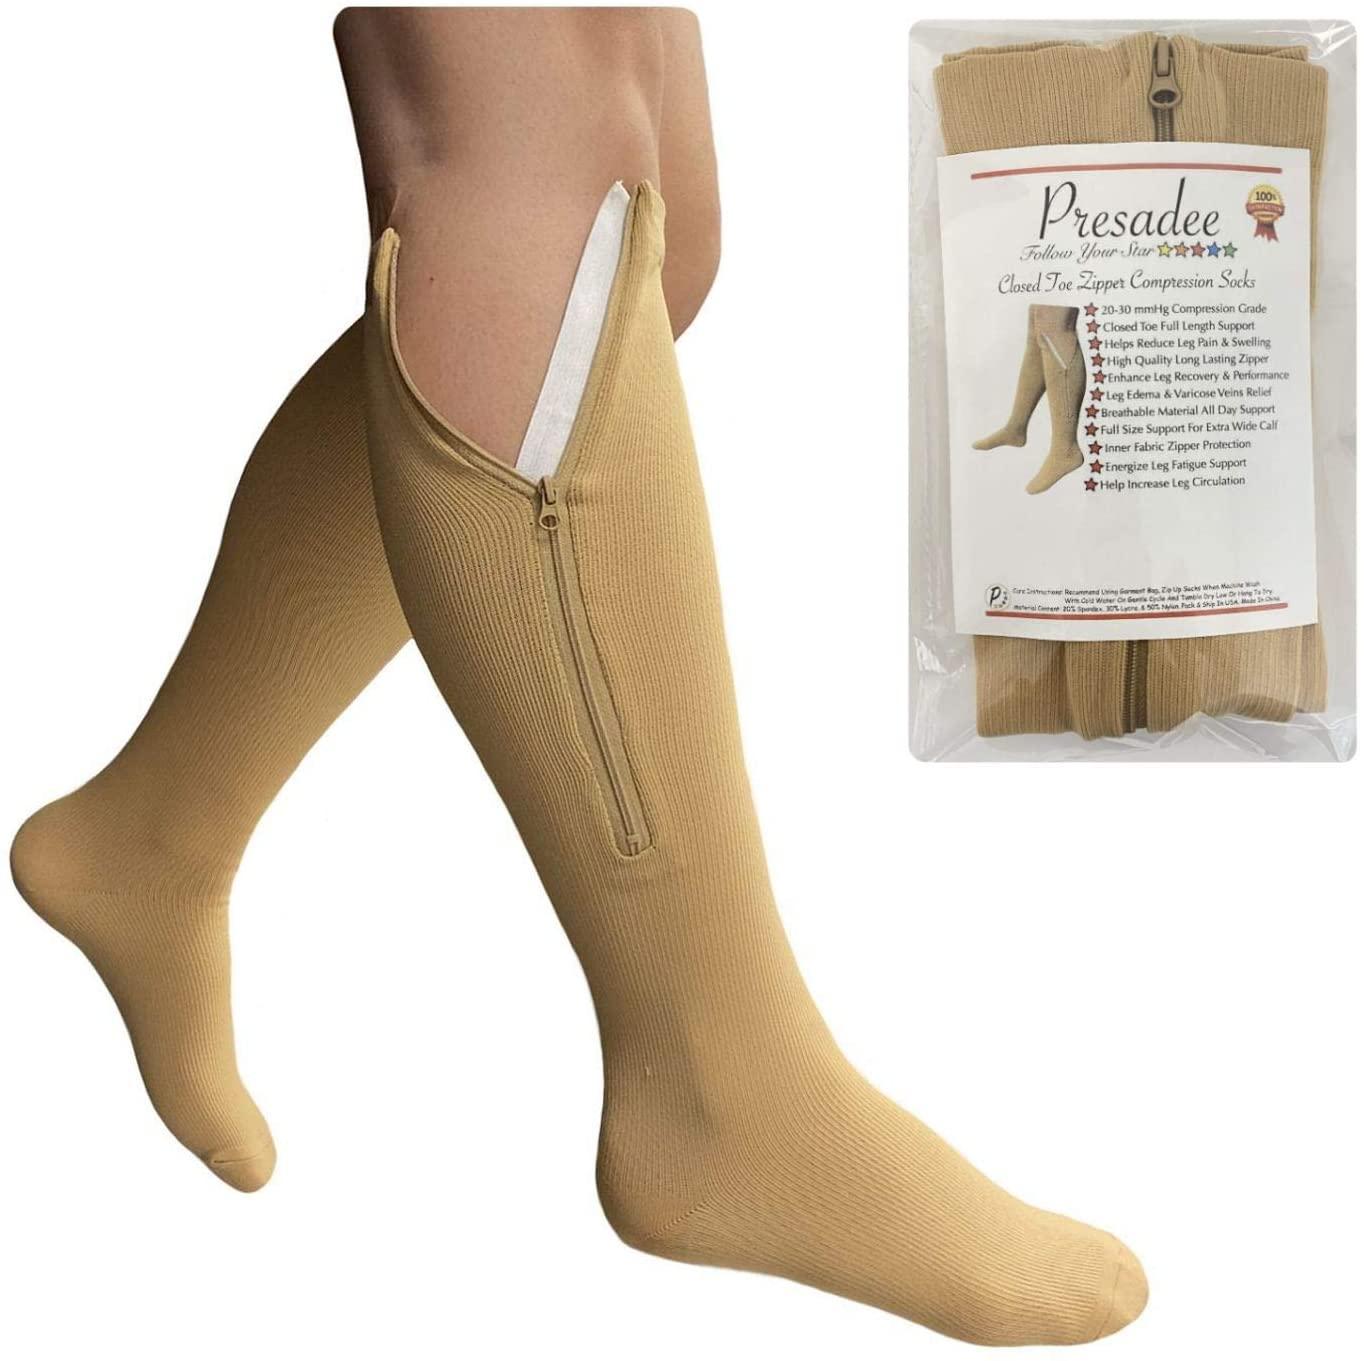 Presadee Original Closed Toe 20-30 mmHg Firm Compression Leg Calf Zipper Socks (Beige, 2X-Large)